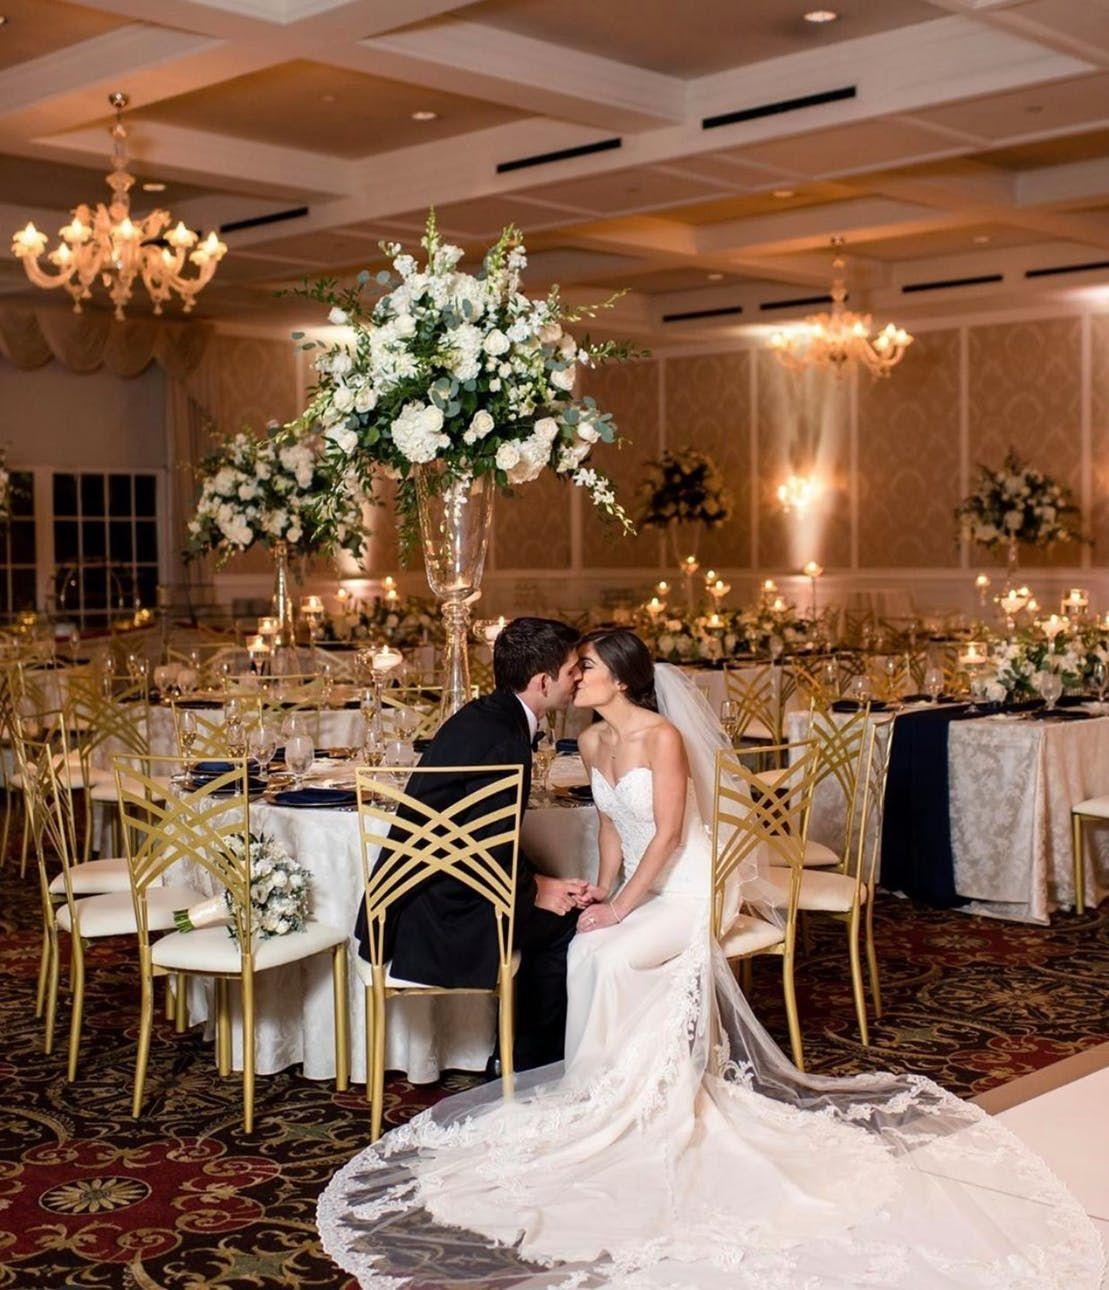 Royal Park Hotel Weddings Detroit Wedding Venue Rochester Mi 48307 In 2020 Royal Park Hotel Detroit Wedding Venue Hotel Wedding Receptions